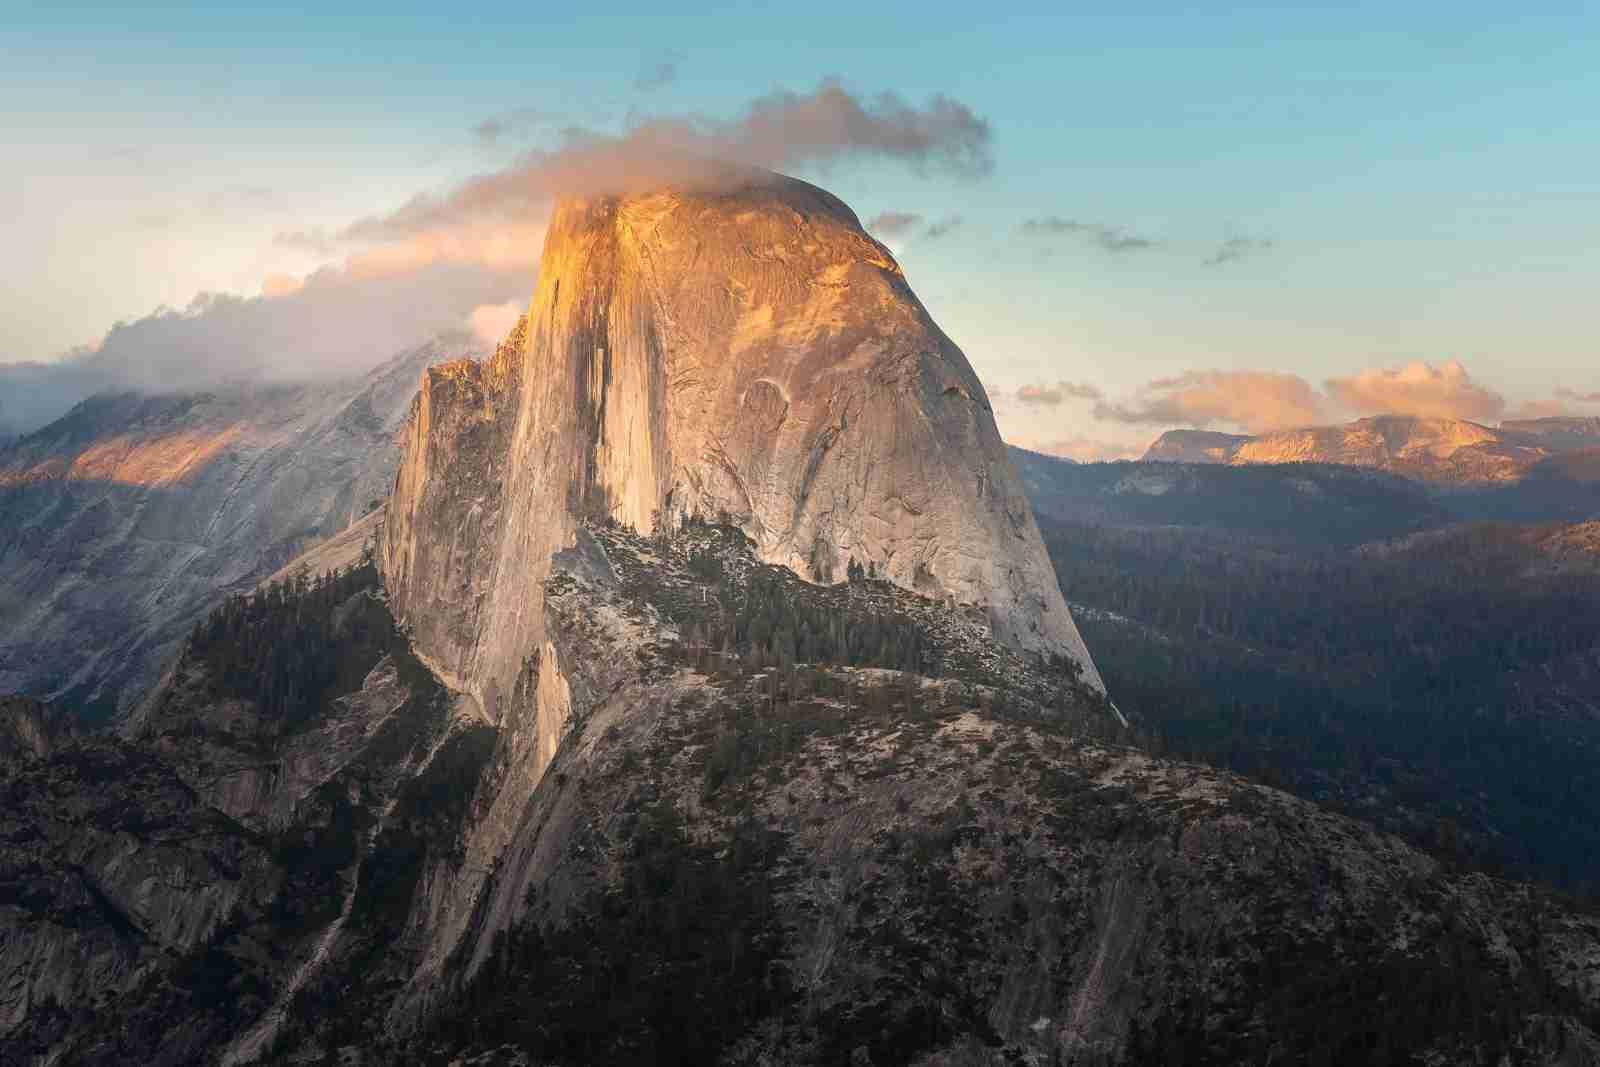 Half Dome at Yosemite National Park. (Photo by Noradoa/Adobe Stock)